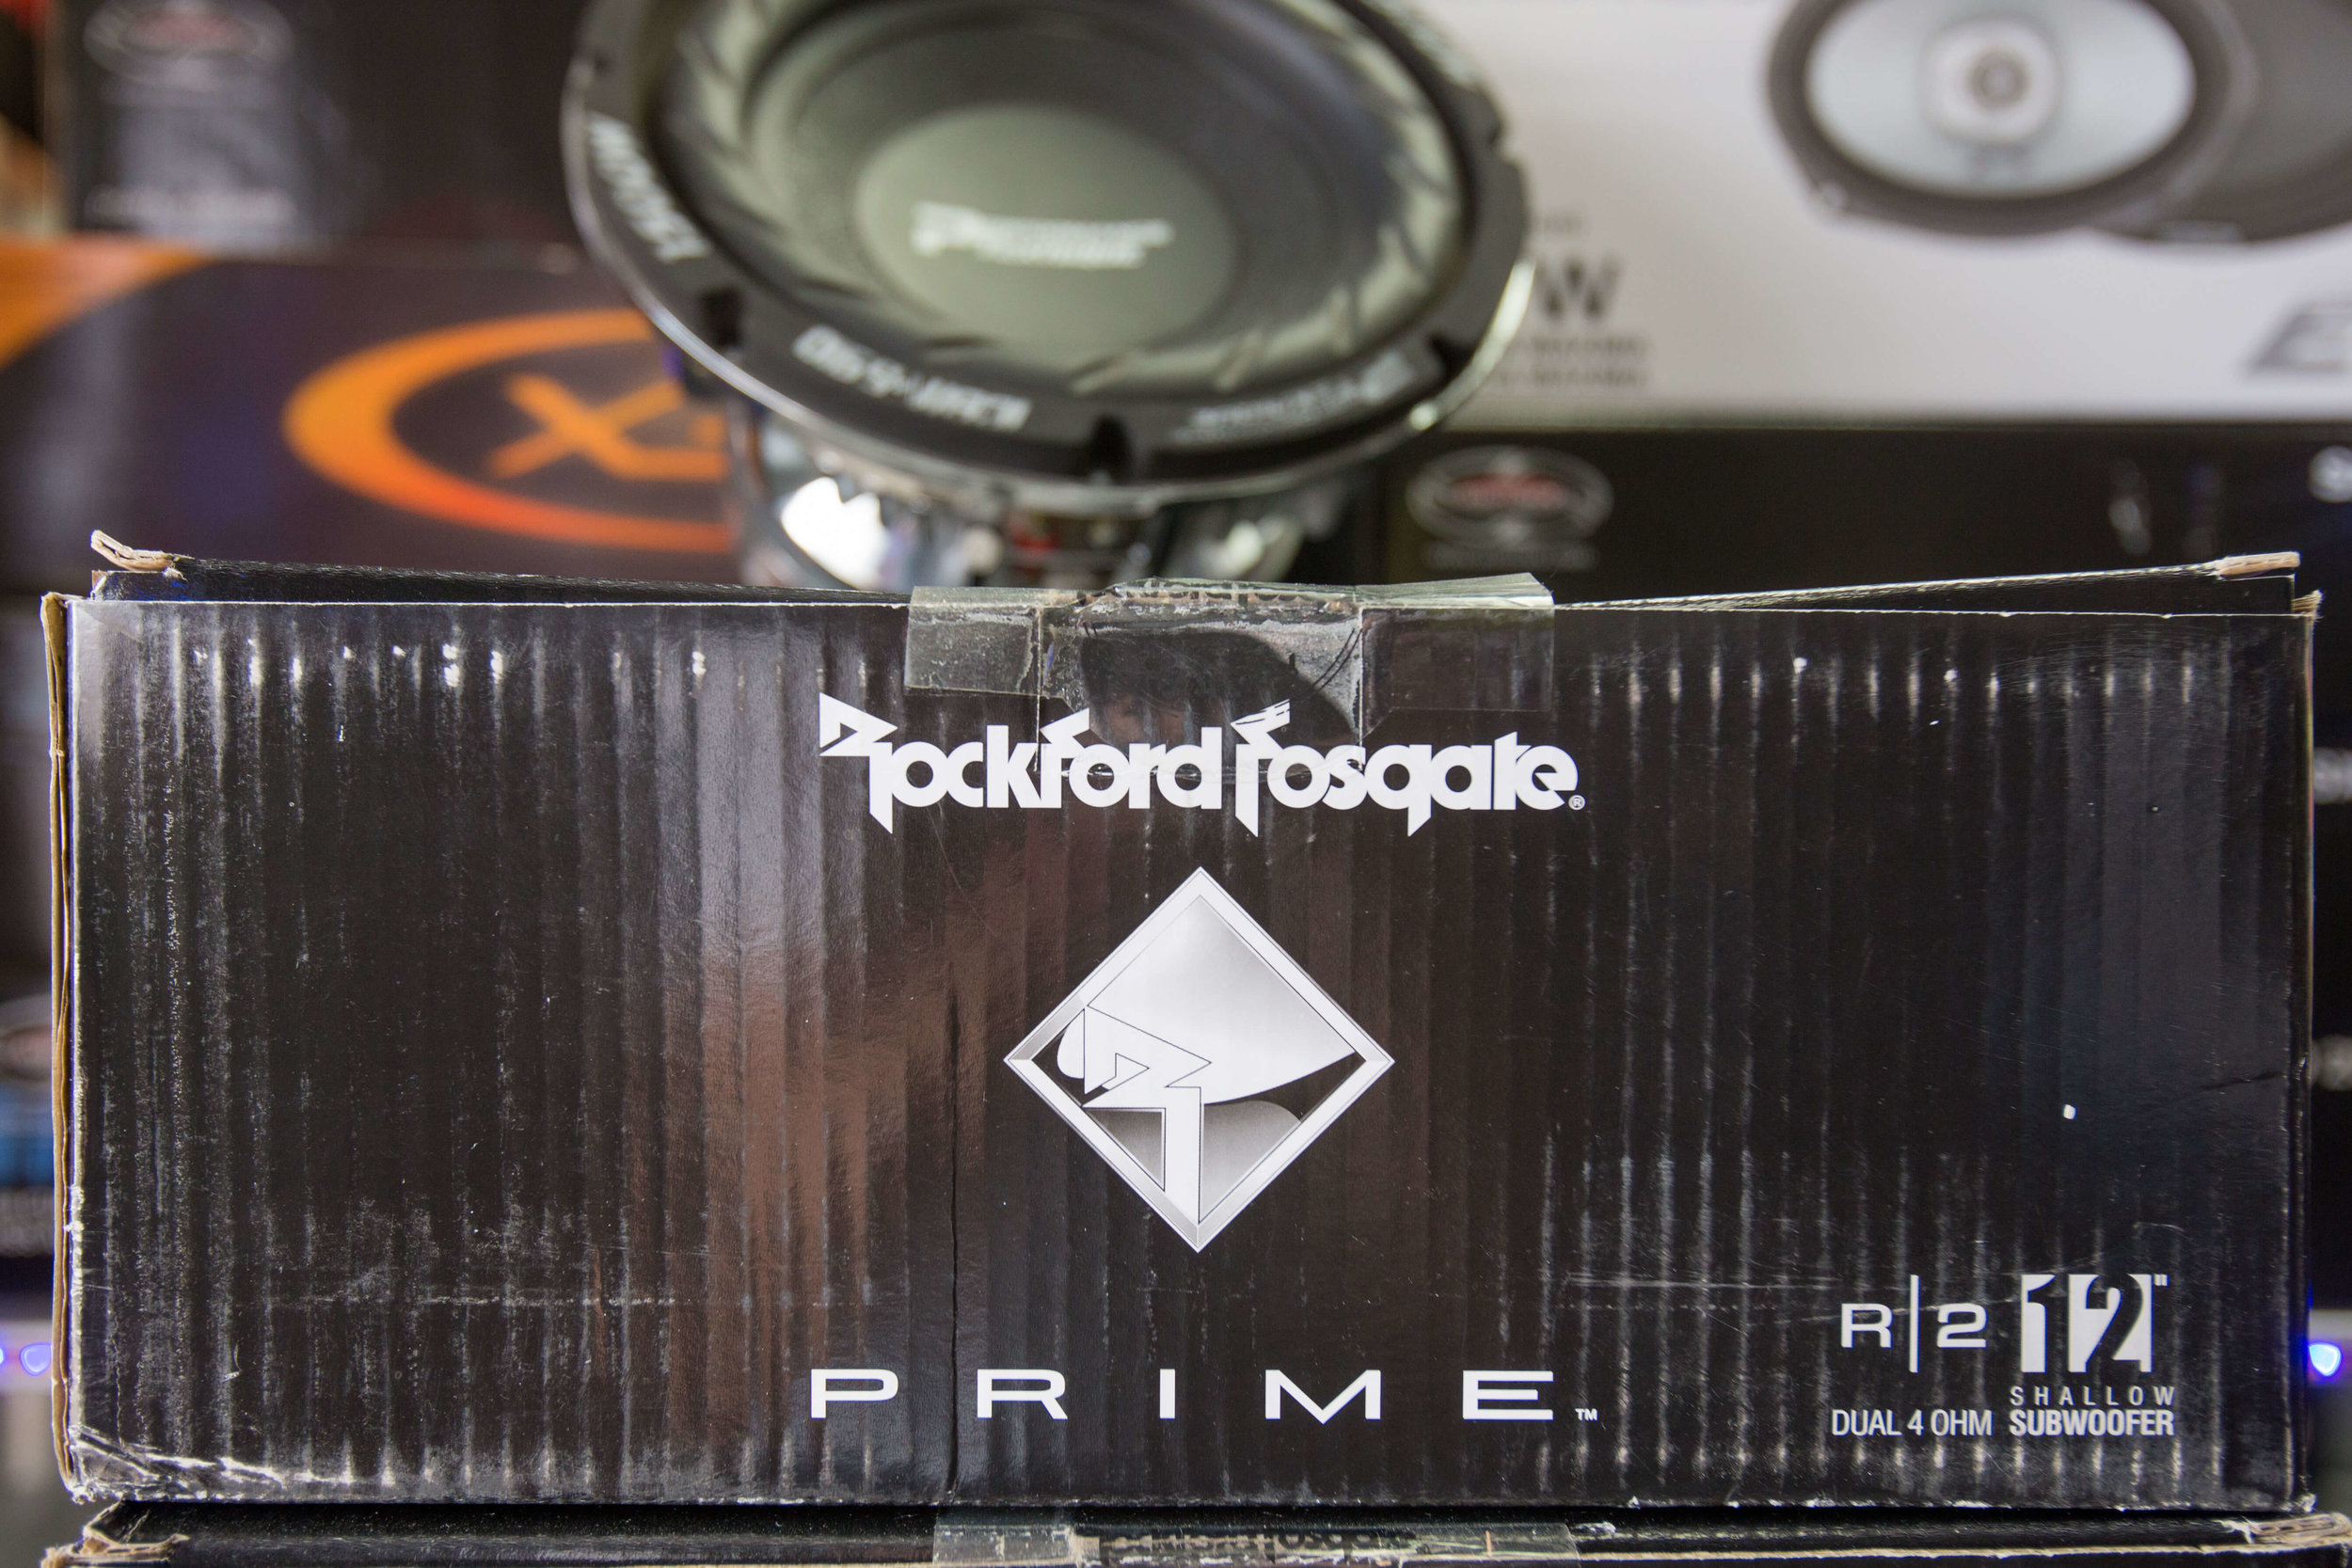 Rockford Fosgate Stereo System Installation San Diego